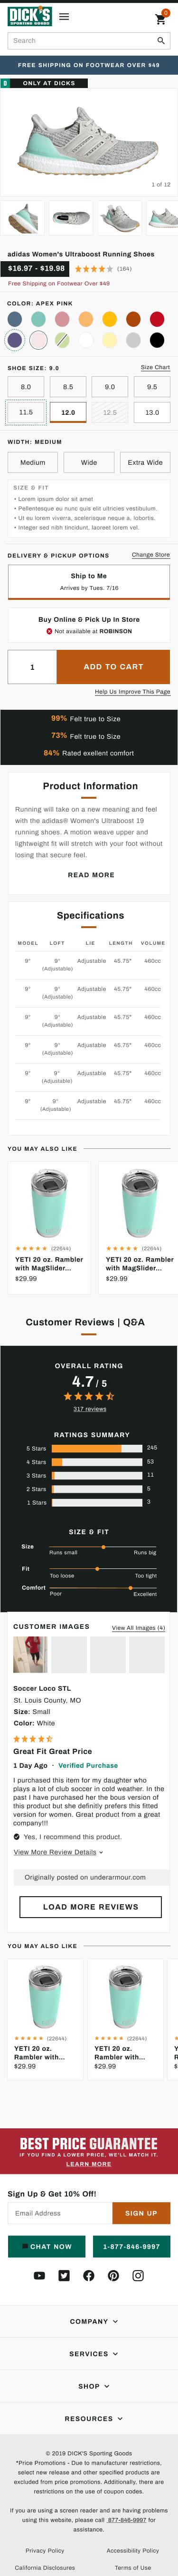 Product Details Page Final Mobile Design